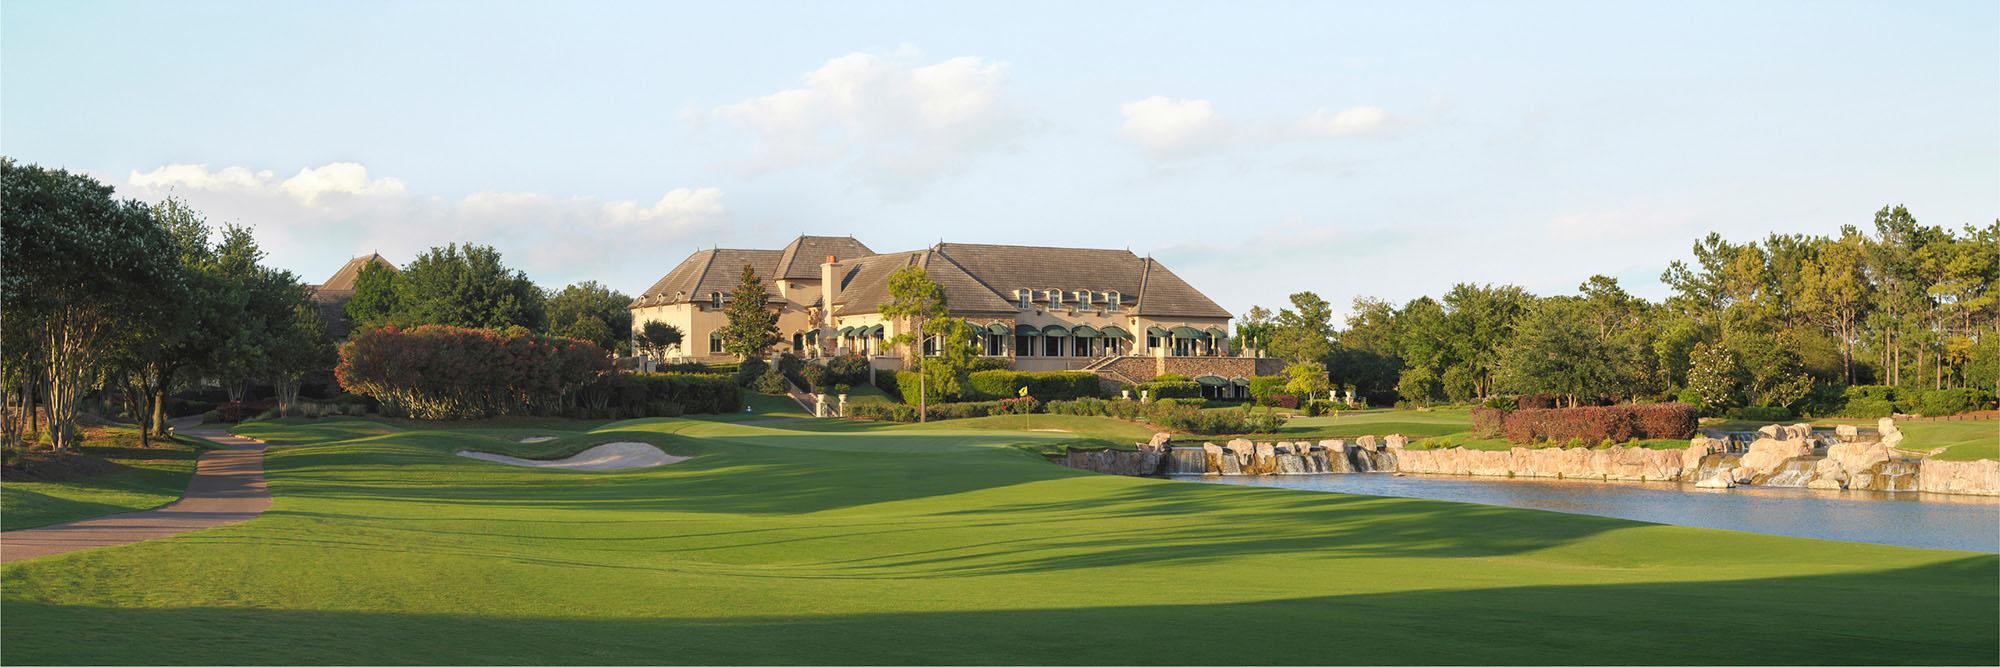 Golf Course Image - Royal Oaks No. 18